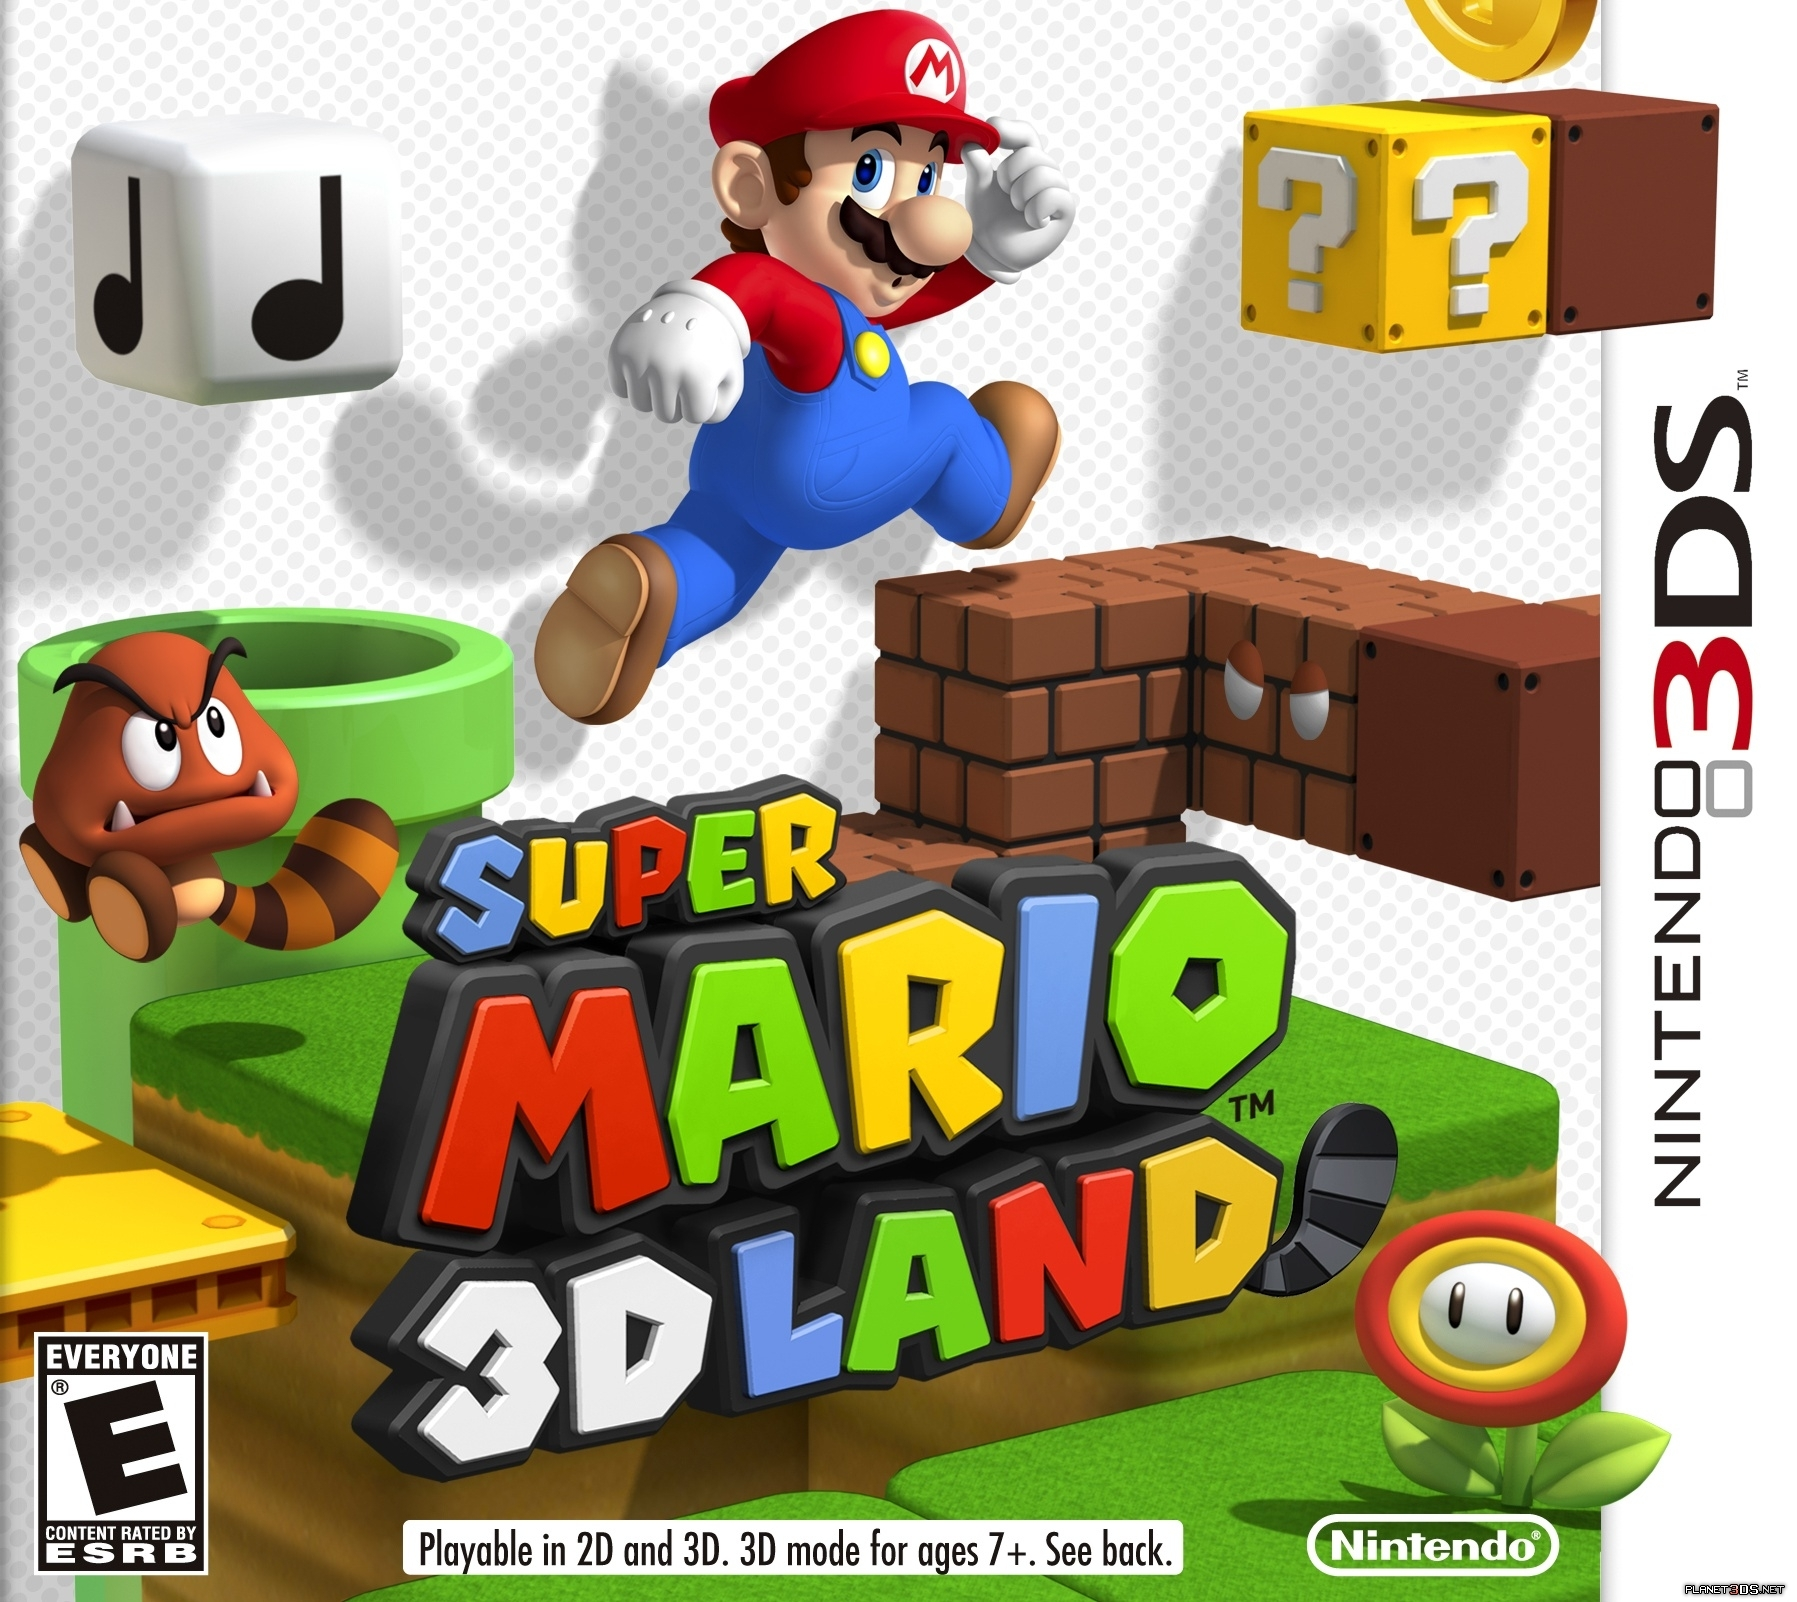 Mario bros for 3ds - Sports stores atlanta